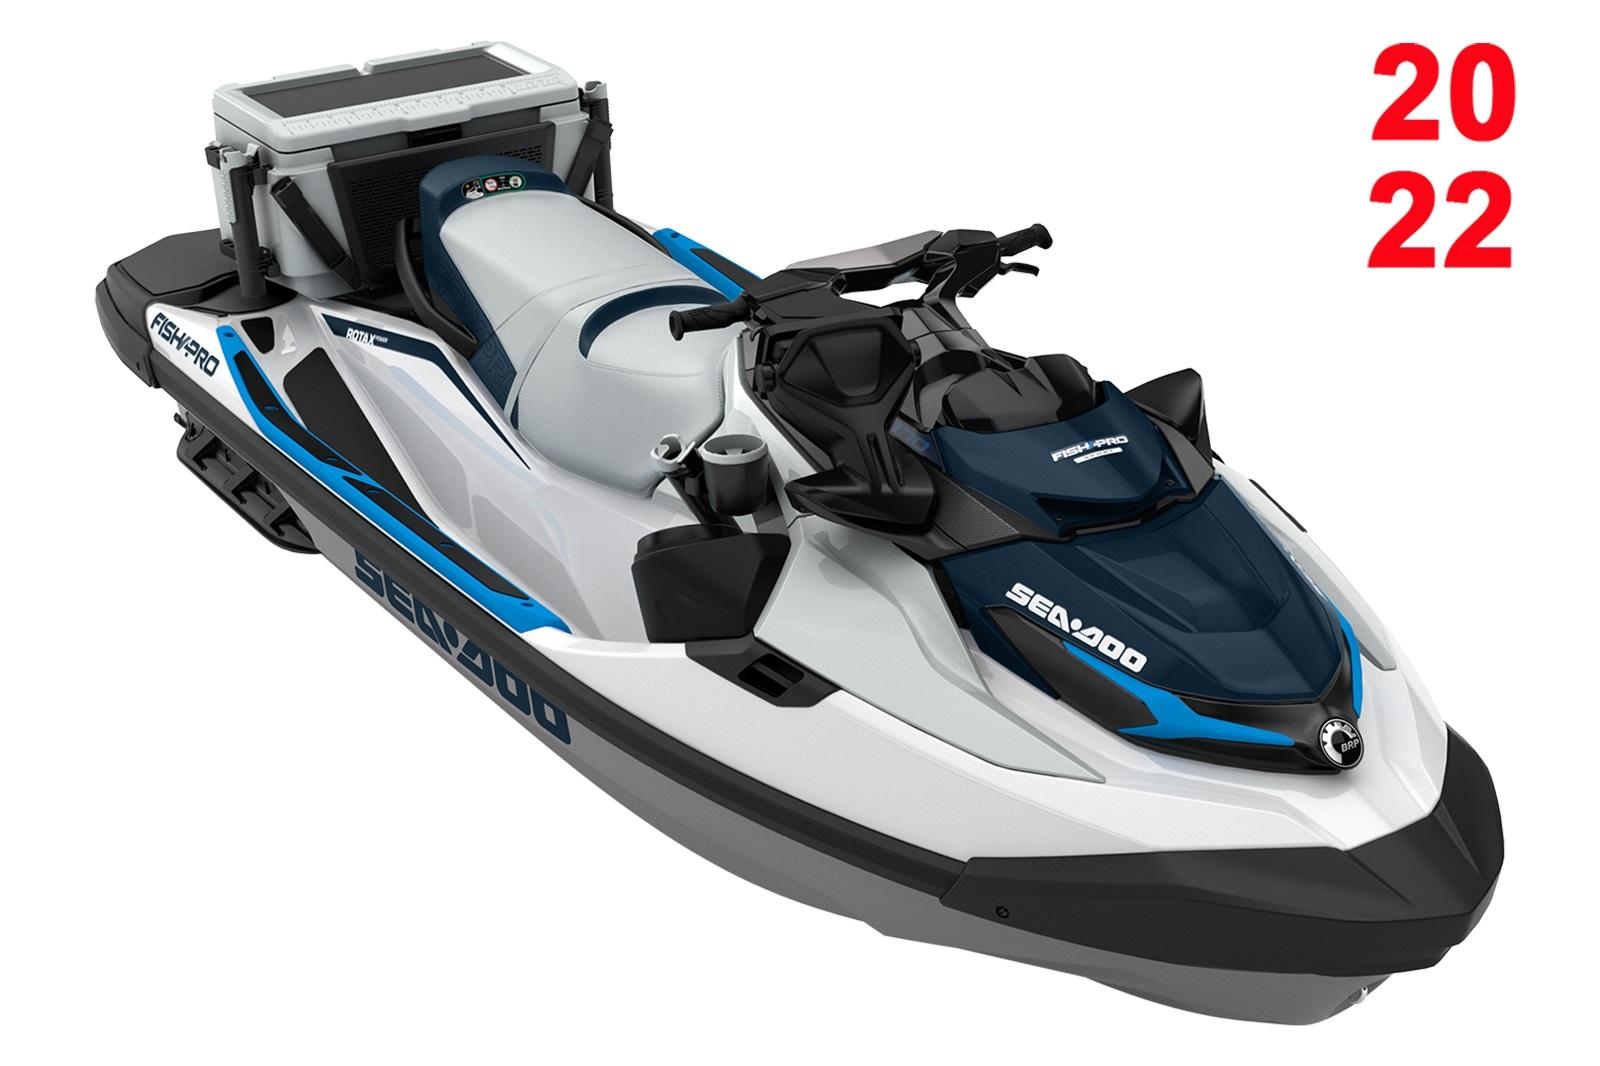 Sea Doo FISHPro Sport 170 3-up 170hp bílo-modrý